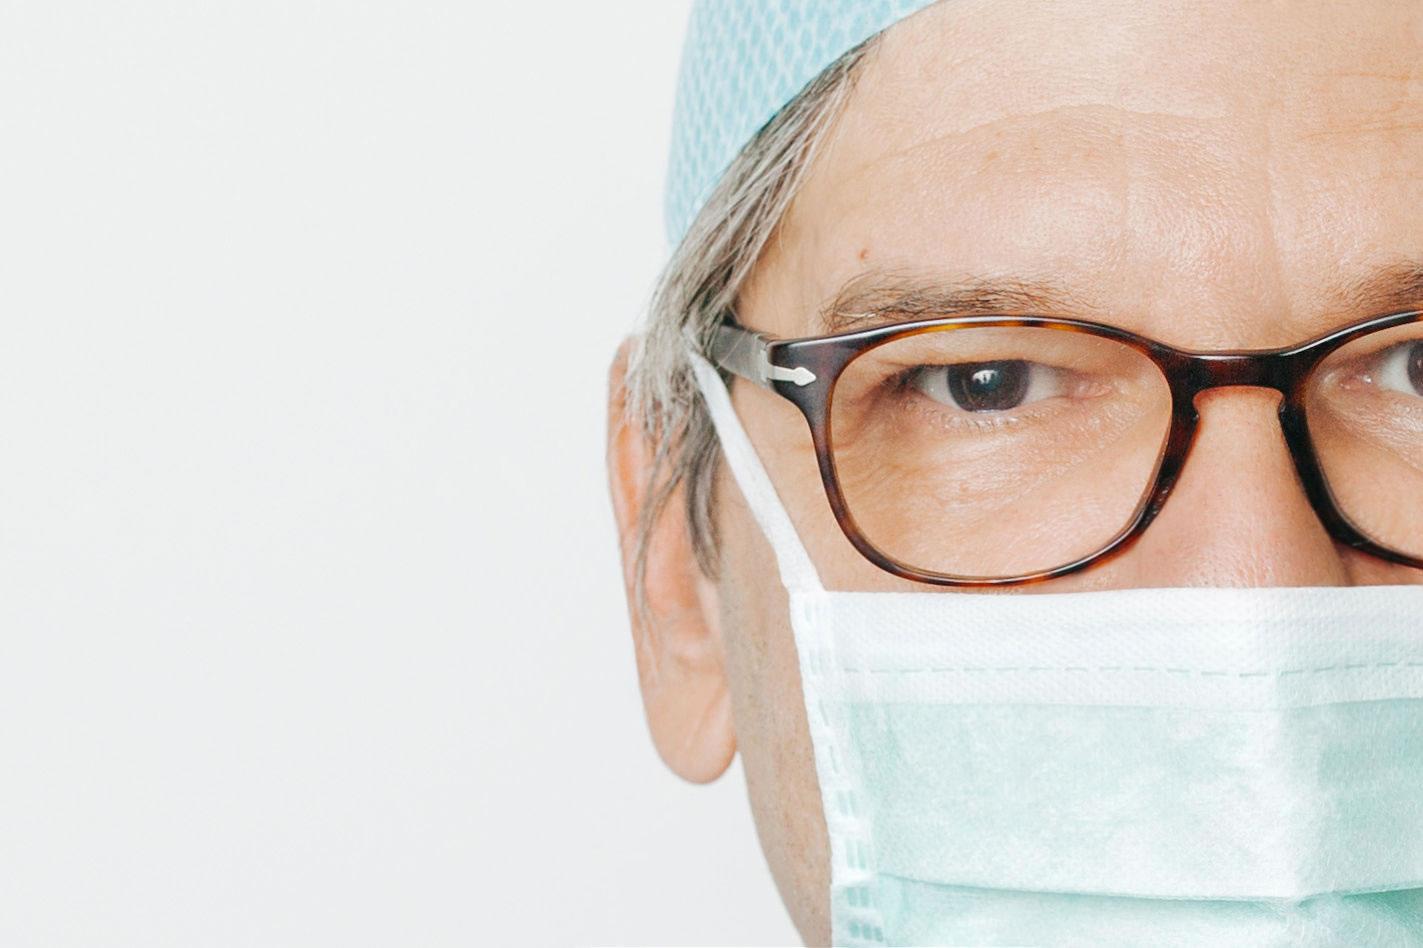 Dr. med. <br />Caius Stoichescu-Weinrauch